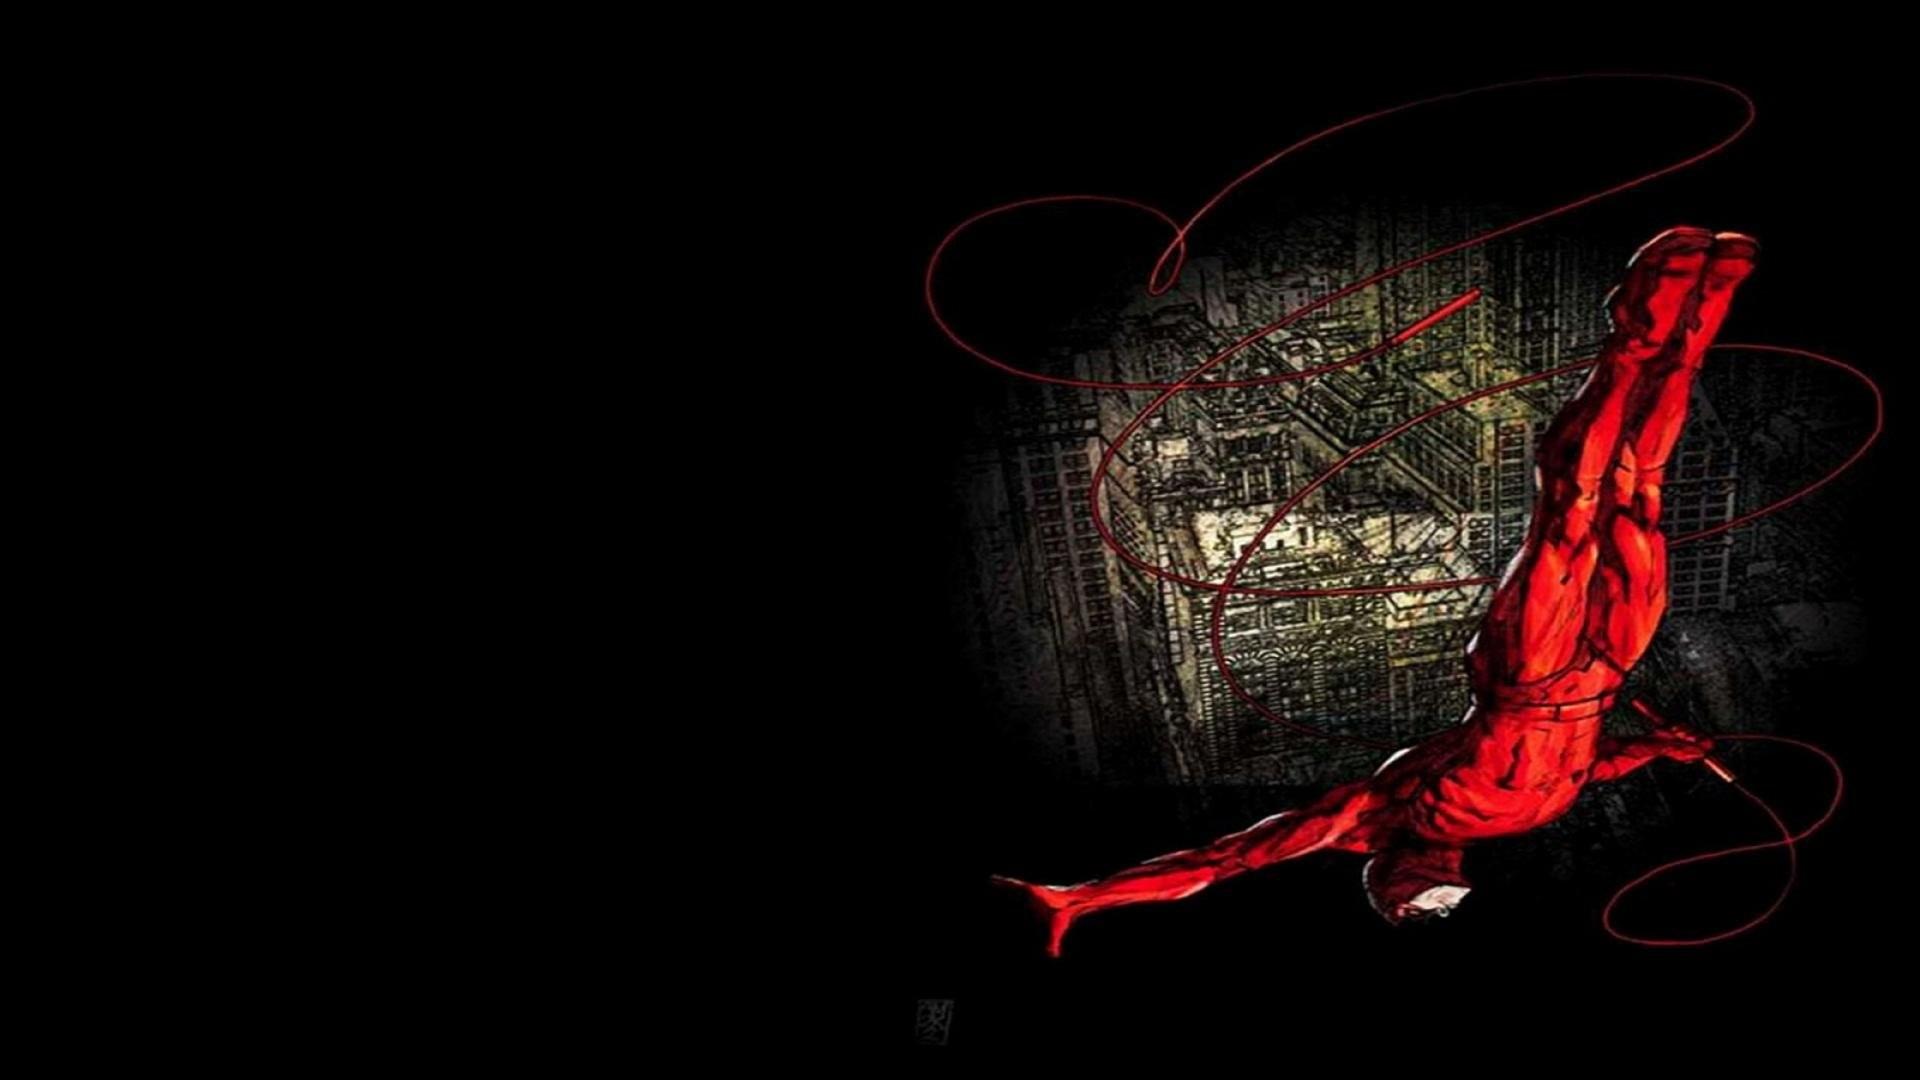 Daredevil 2015 TV Series Wallpapers | HD Wallpapers